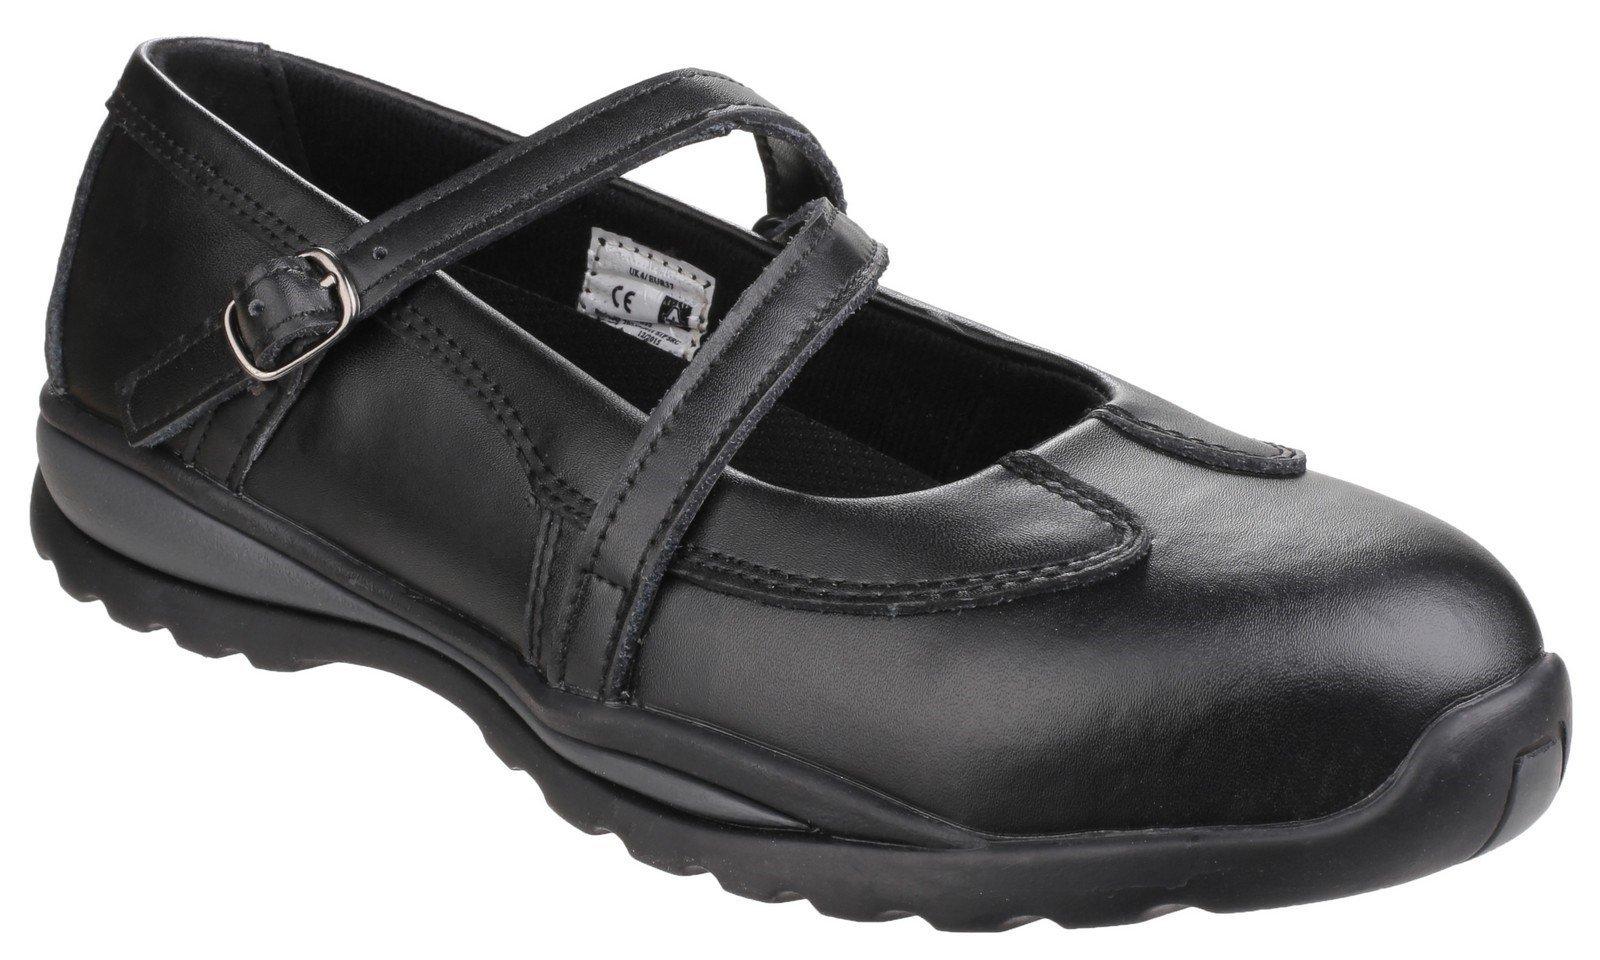 Amblers Women's Safety Slip on Shoe Black 22276 - Black 3